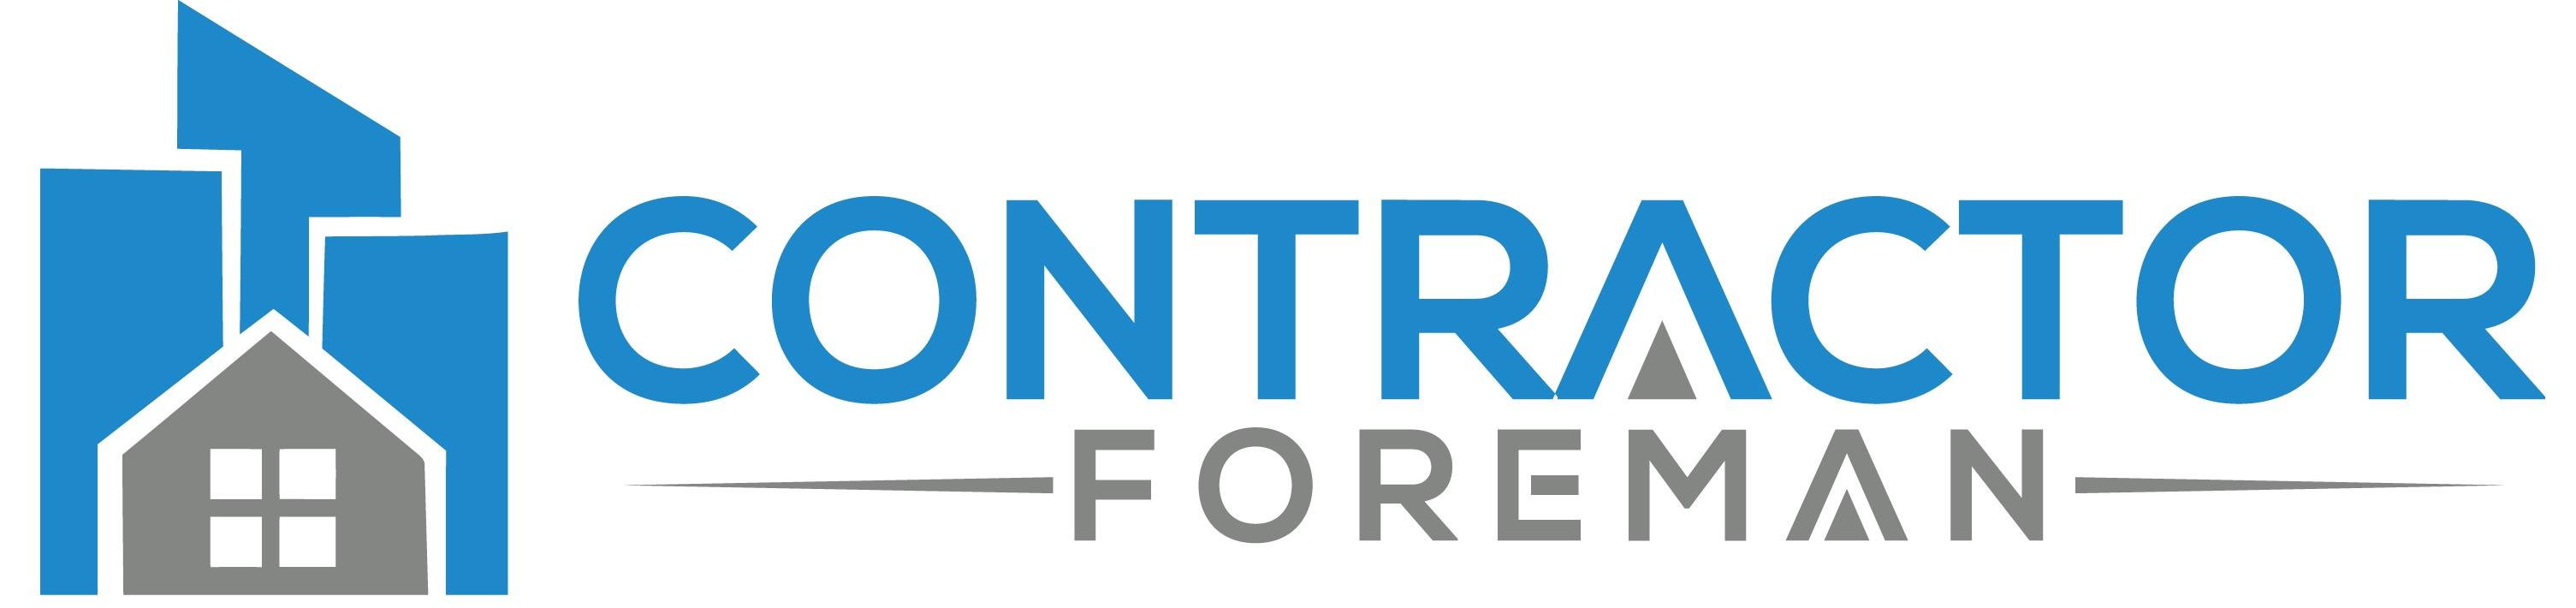 Logo di Contractor Foreman